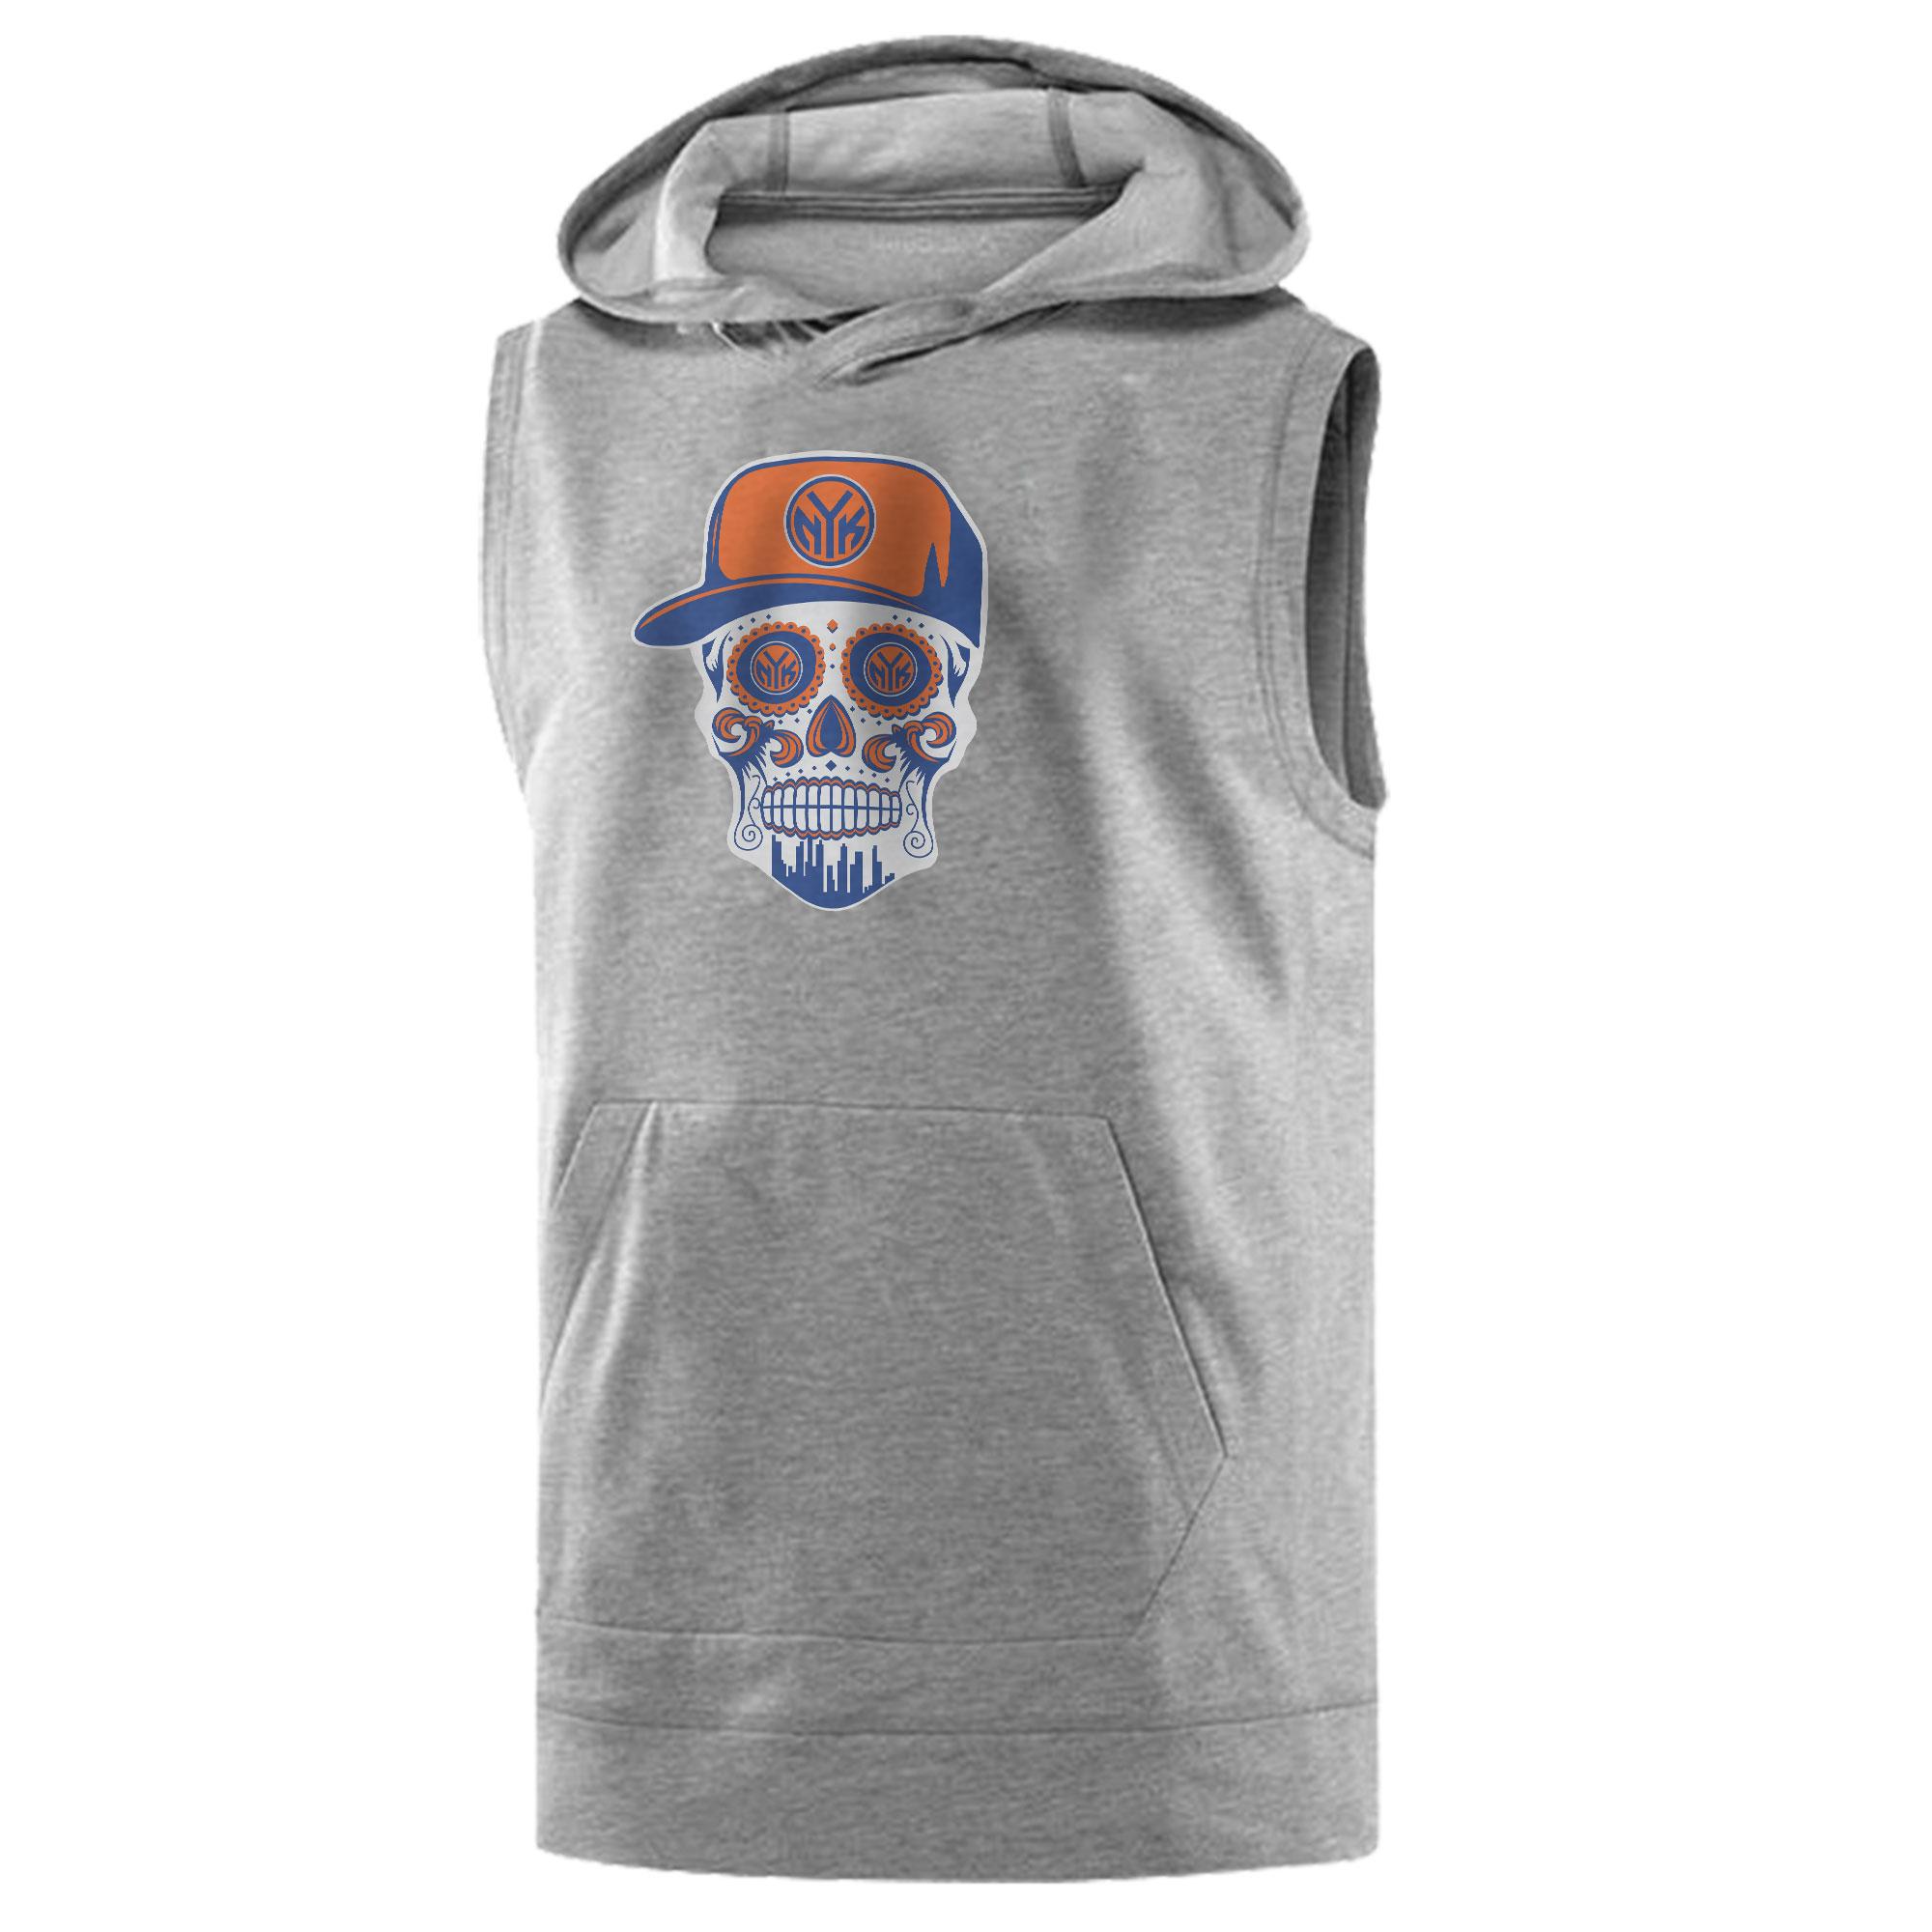 Knicks Skull Sleeveless (KLS-GRY-NP-458-NBA-NYK-SKULL)